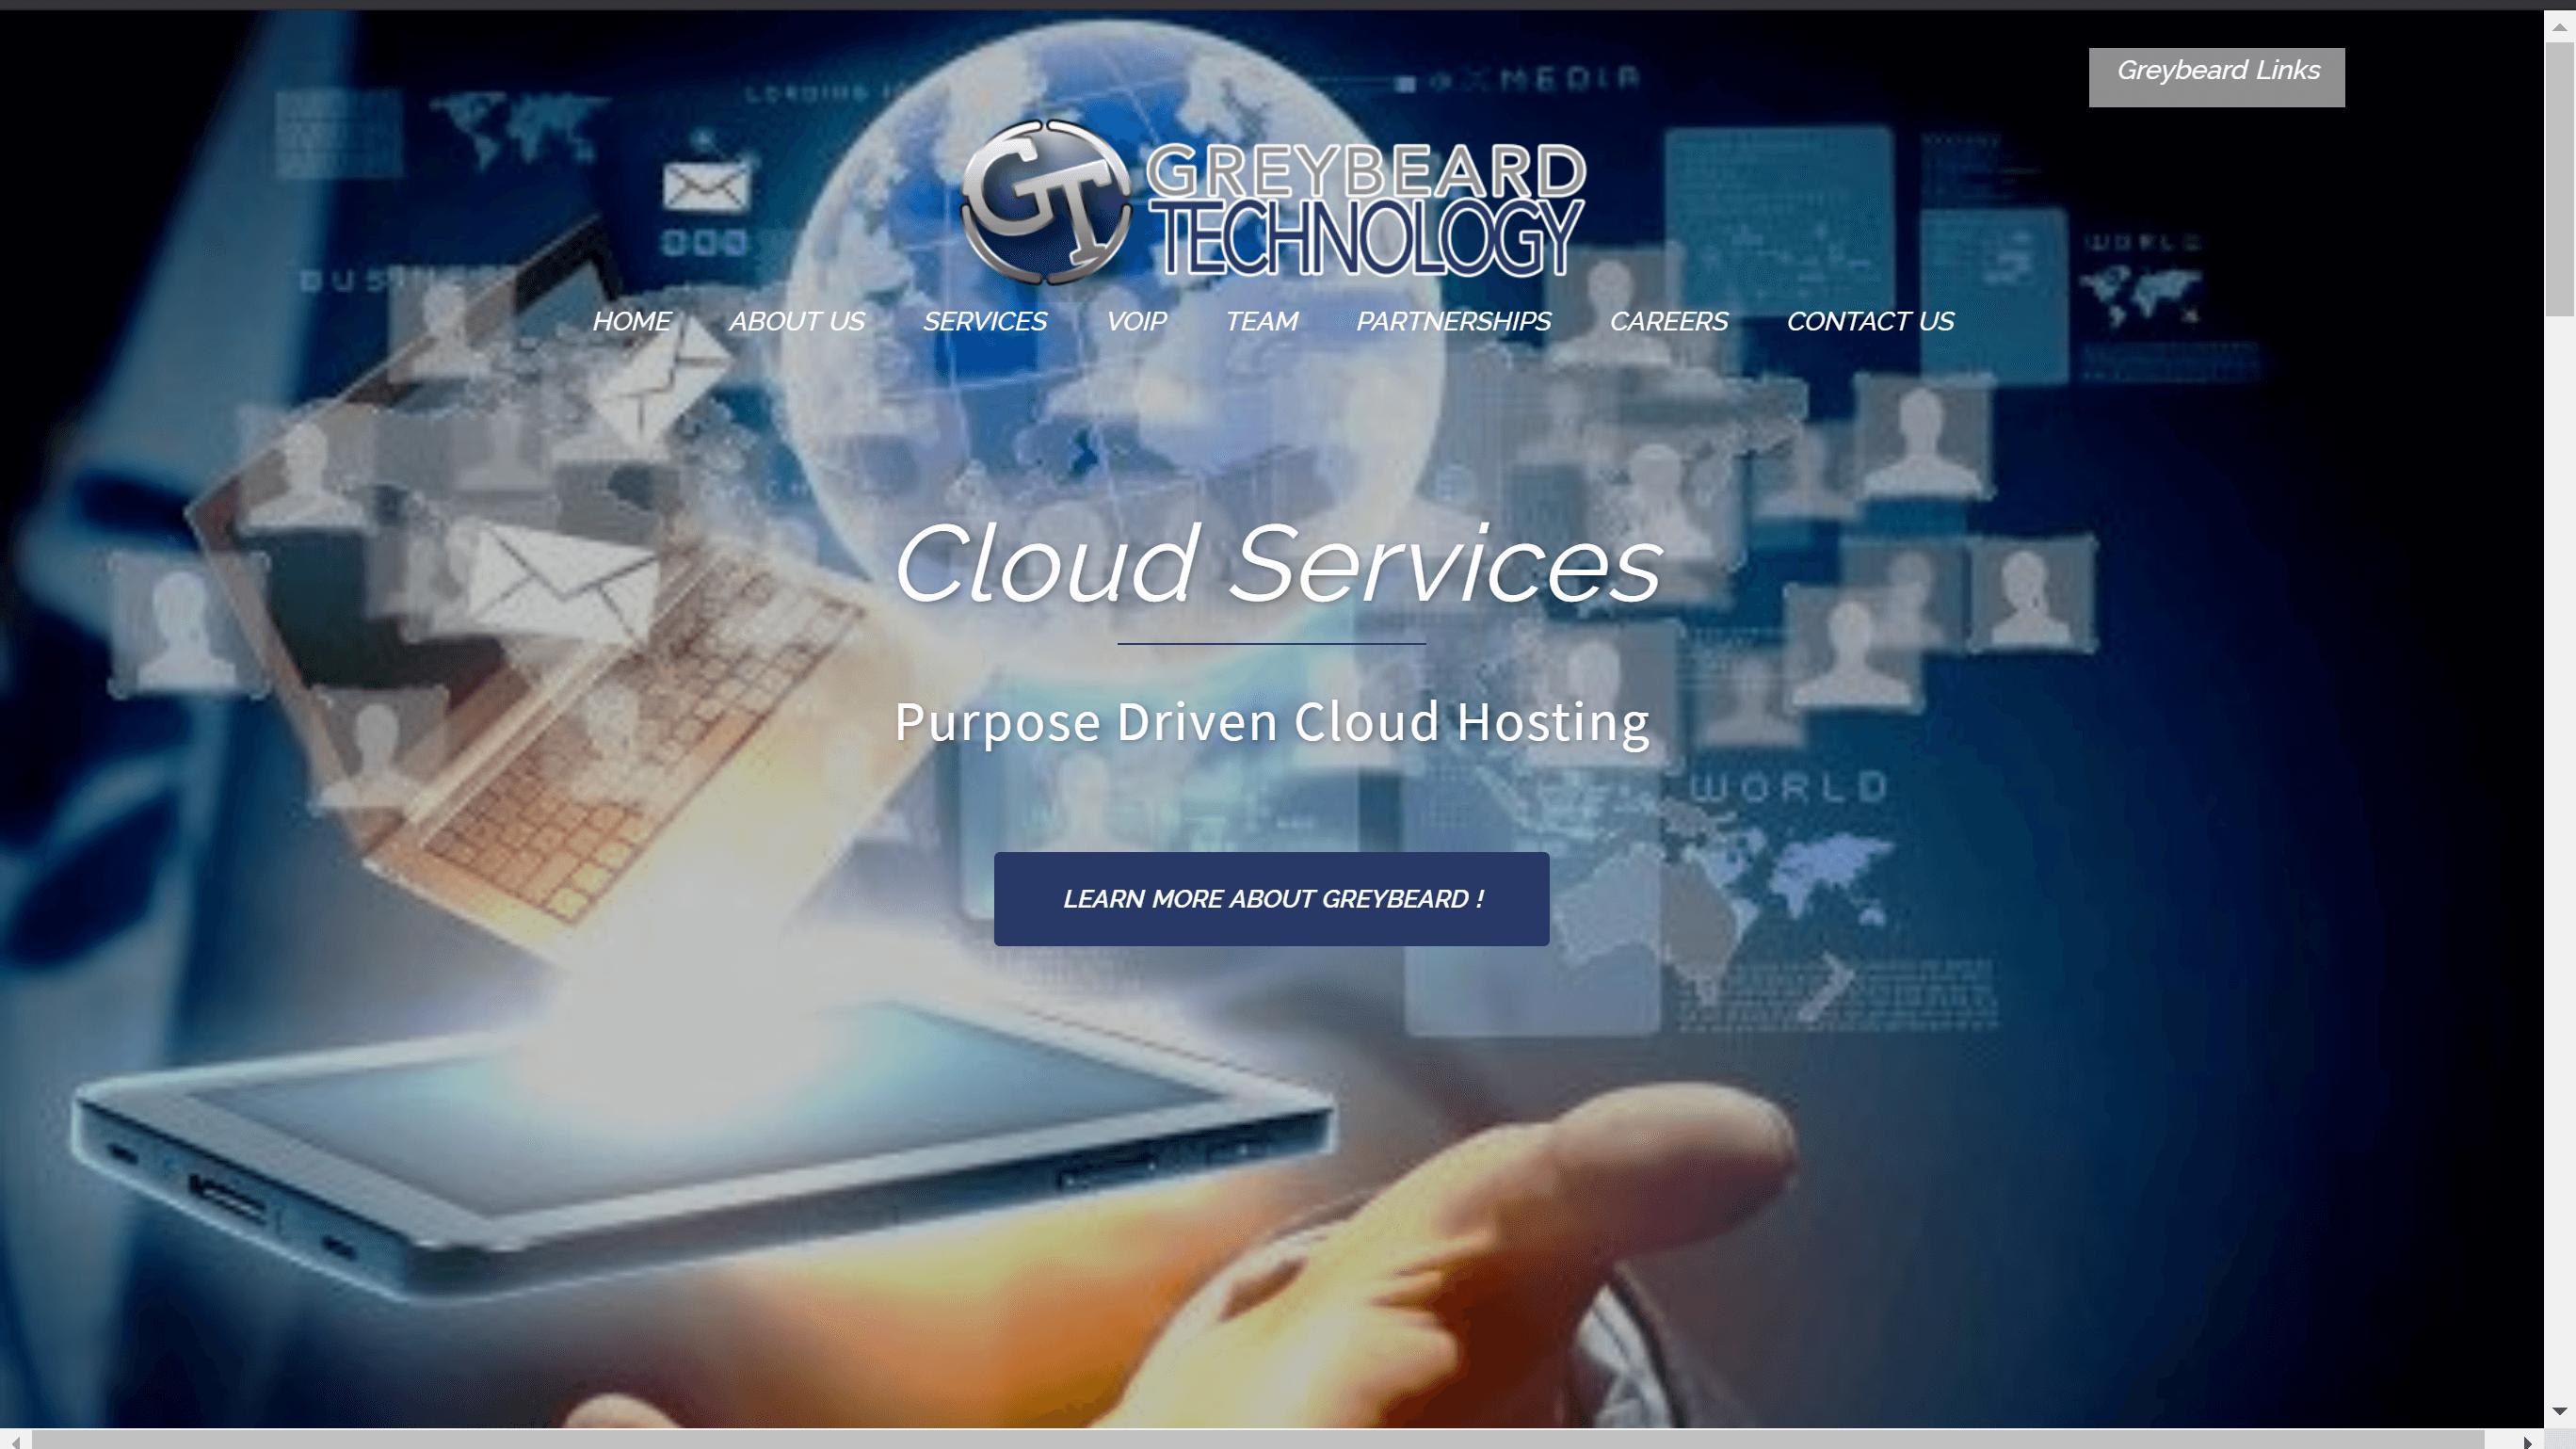 Greybeard Technology